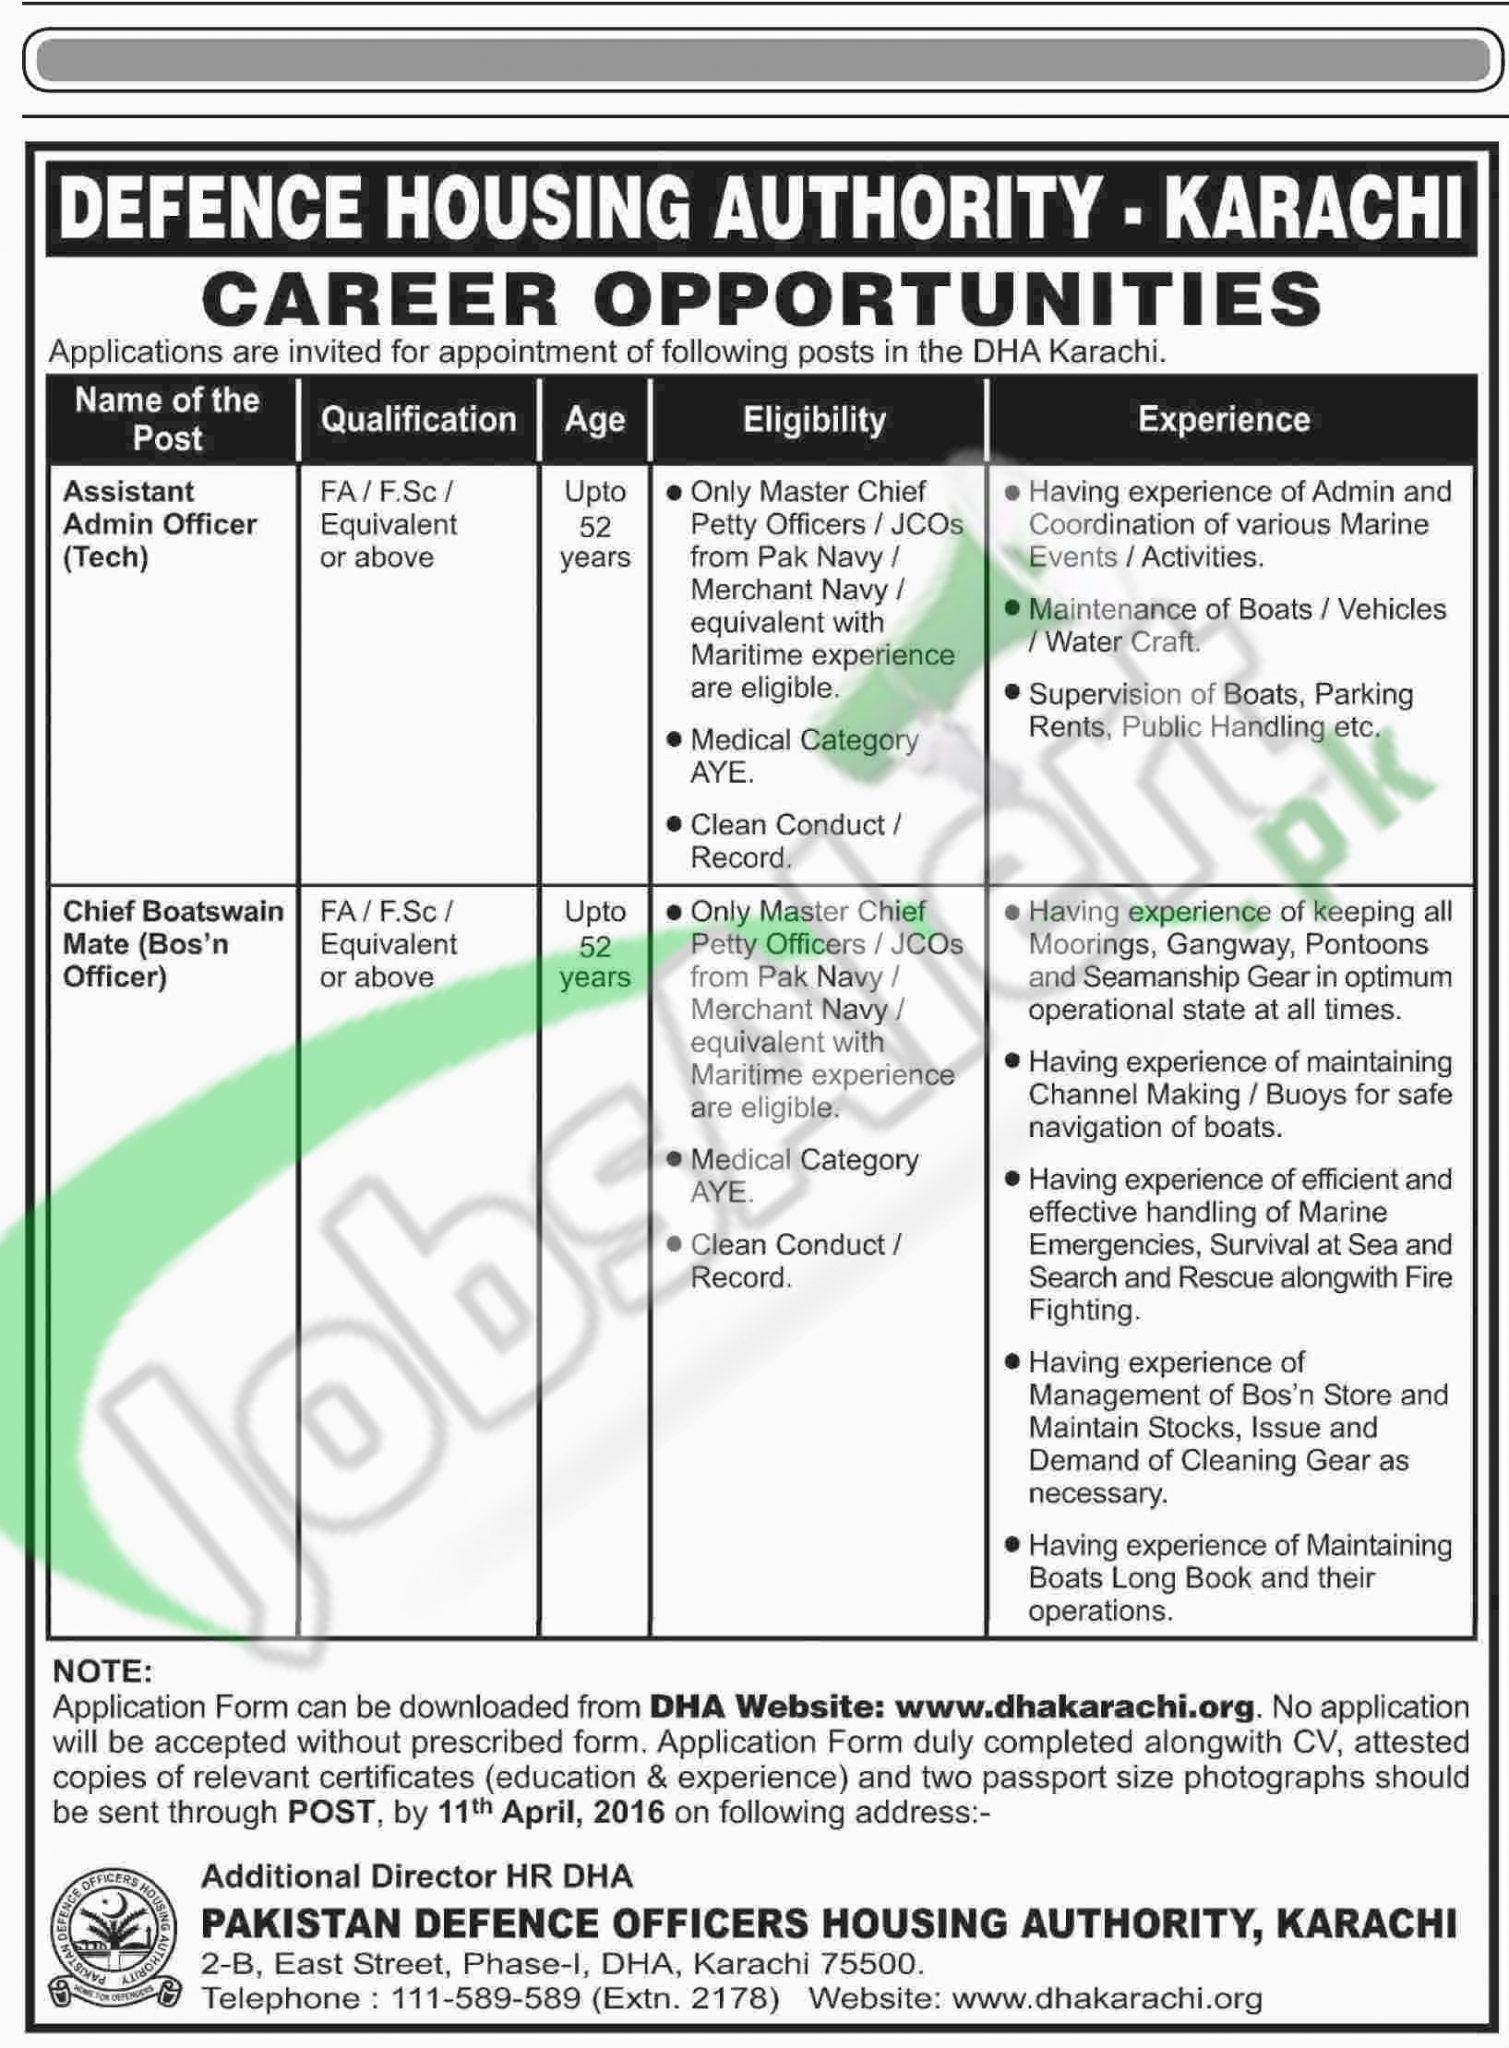 Career Offers in Defence Housing Authority Karachi 2016 www.dhakarachi.org